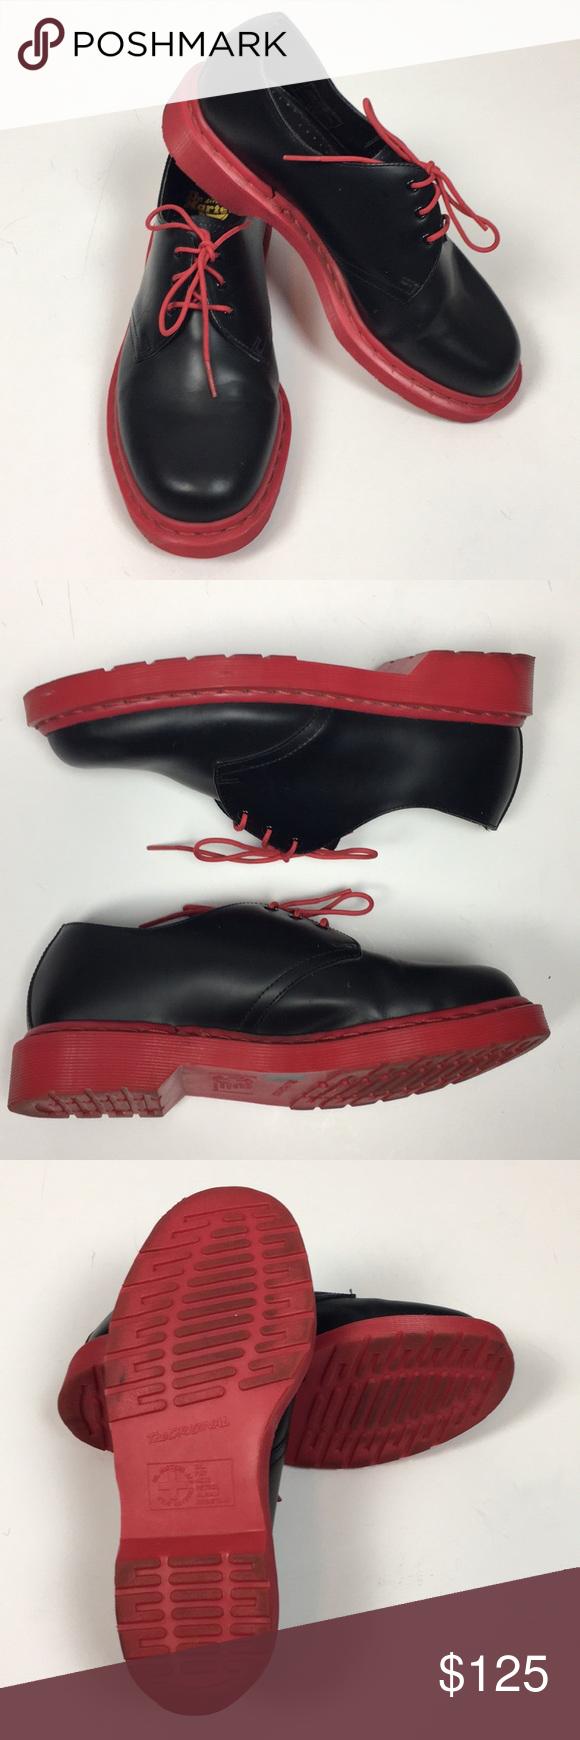 Dr. Martens Black w/ red Soles Shoes